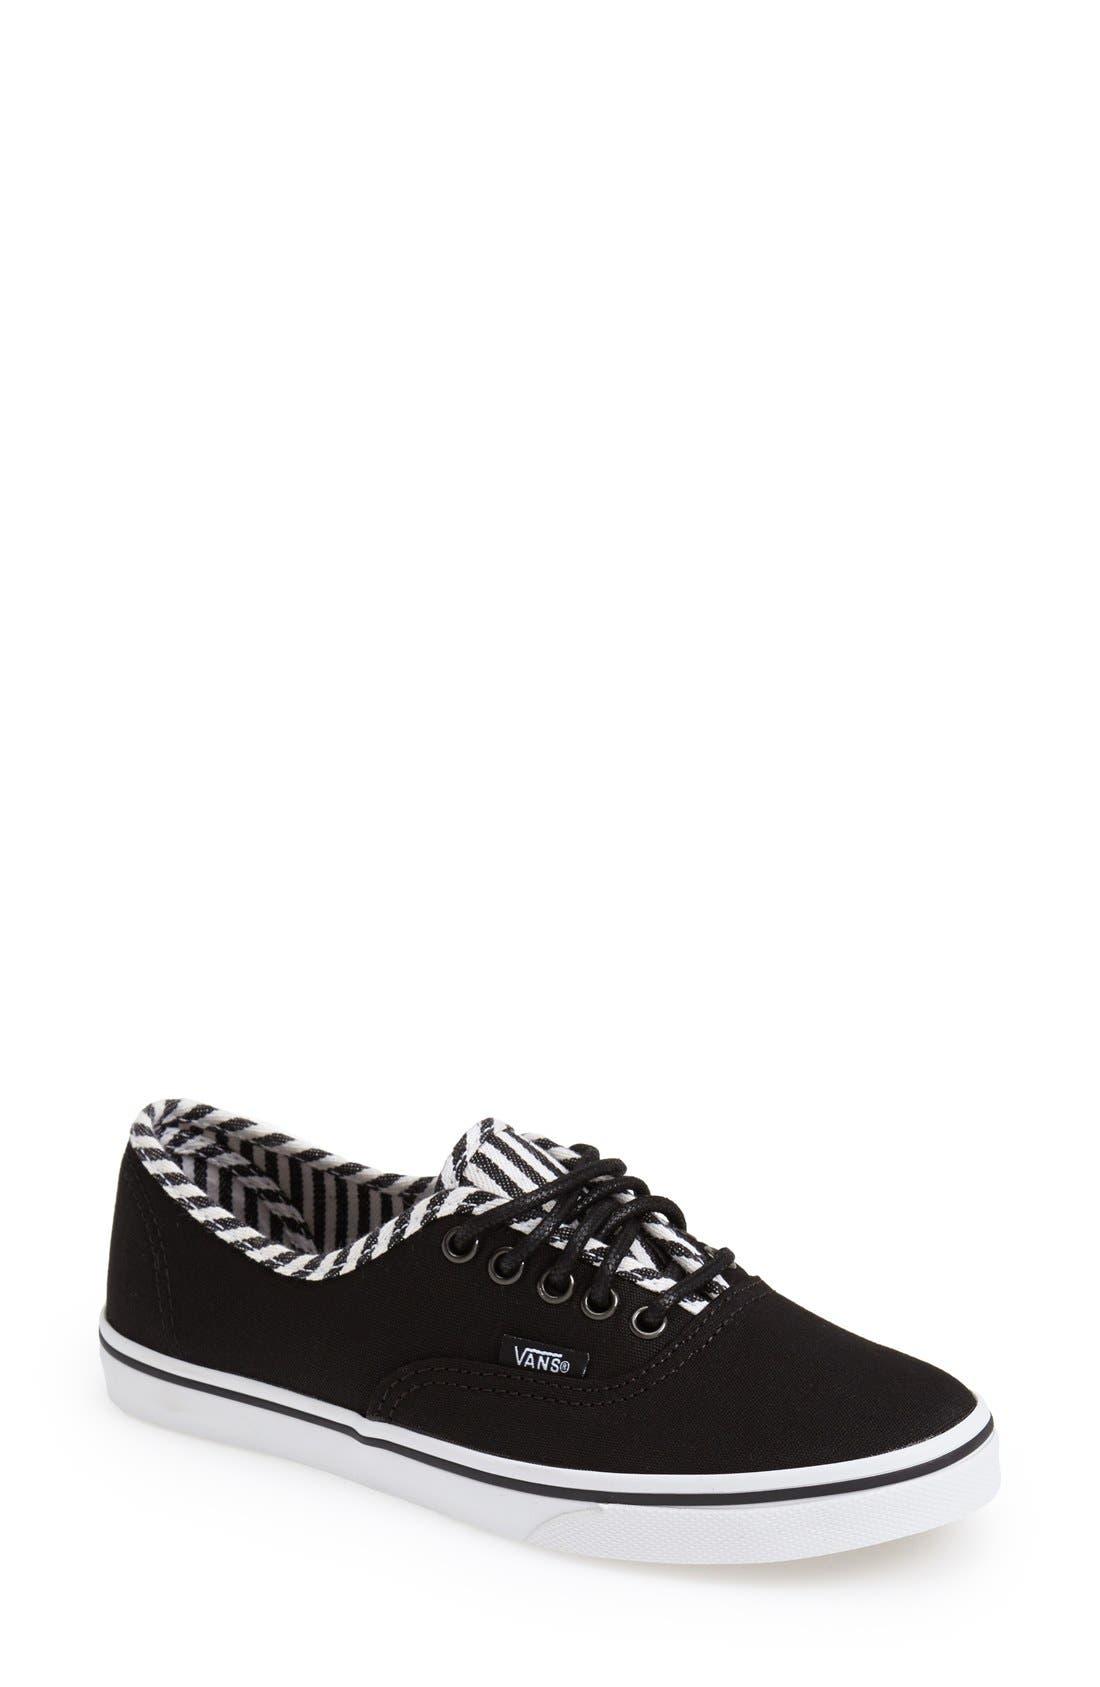 Main Image - Vans 'Authentic - Lo Pro Hickory Stripes' Sneaker (Women)